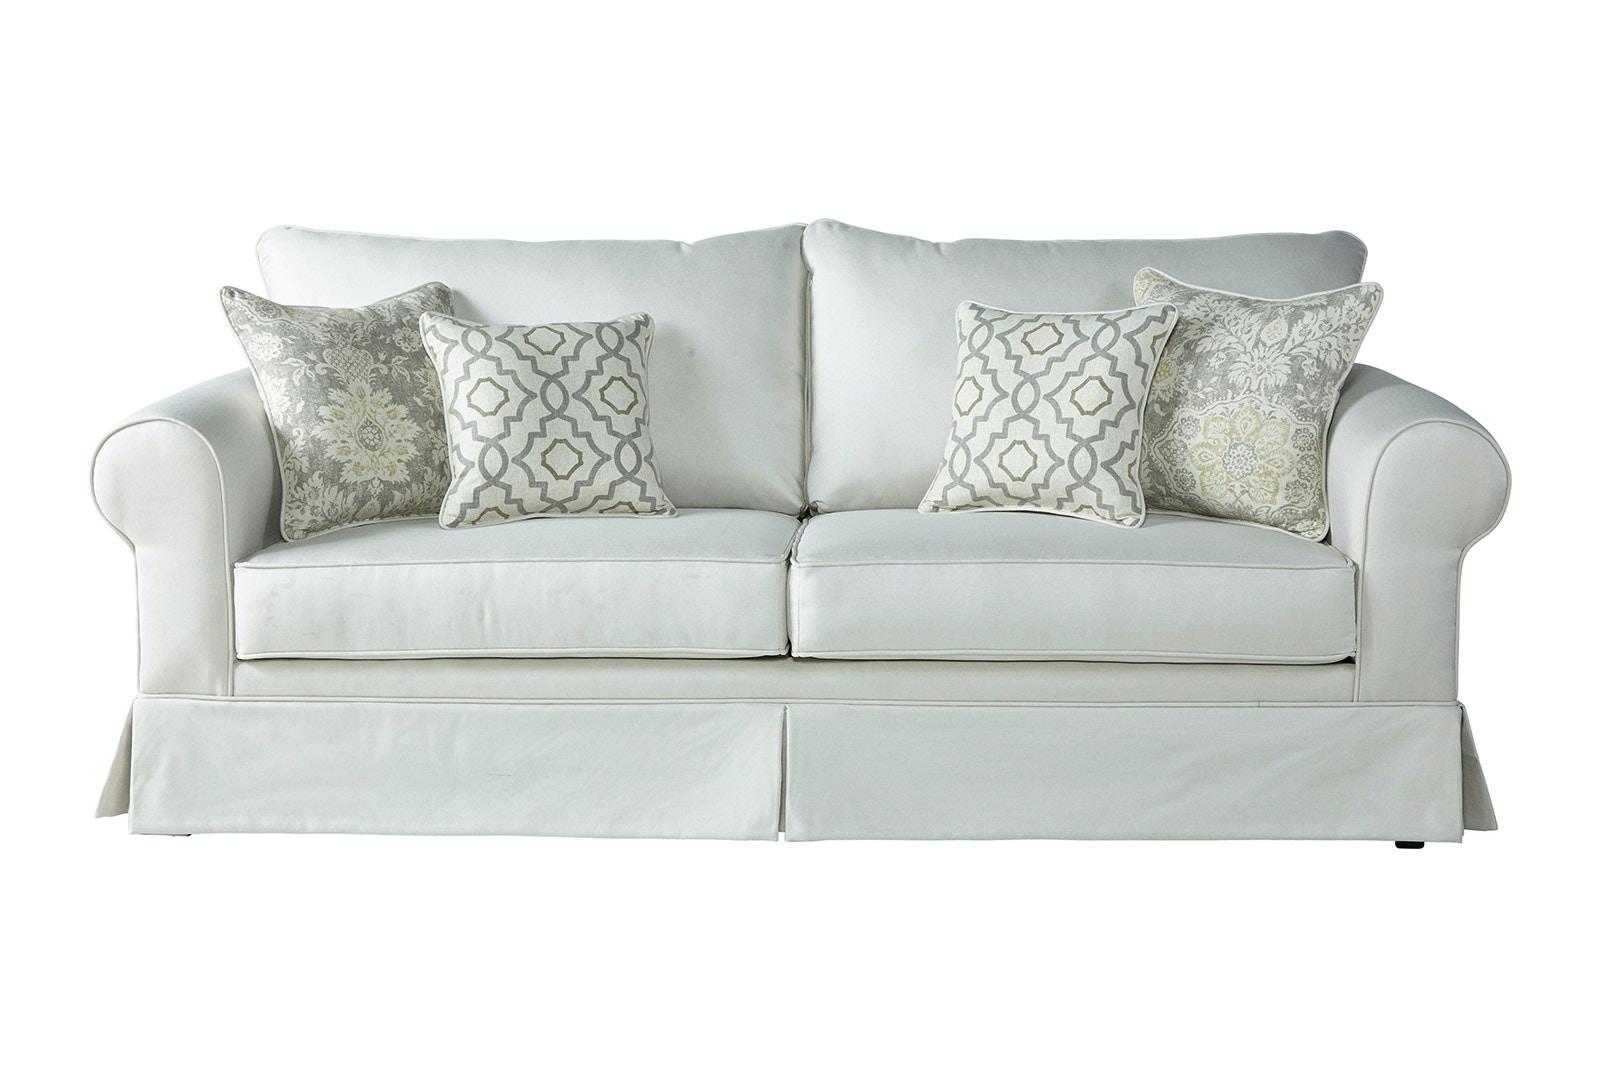 Wonderful 16200S. Sofa · Carol House Discount Price $457.00